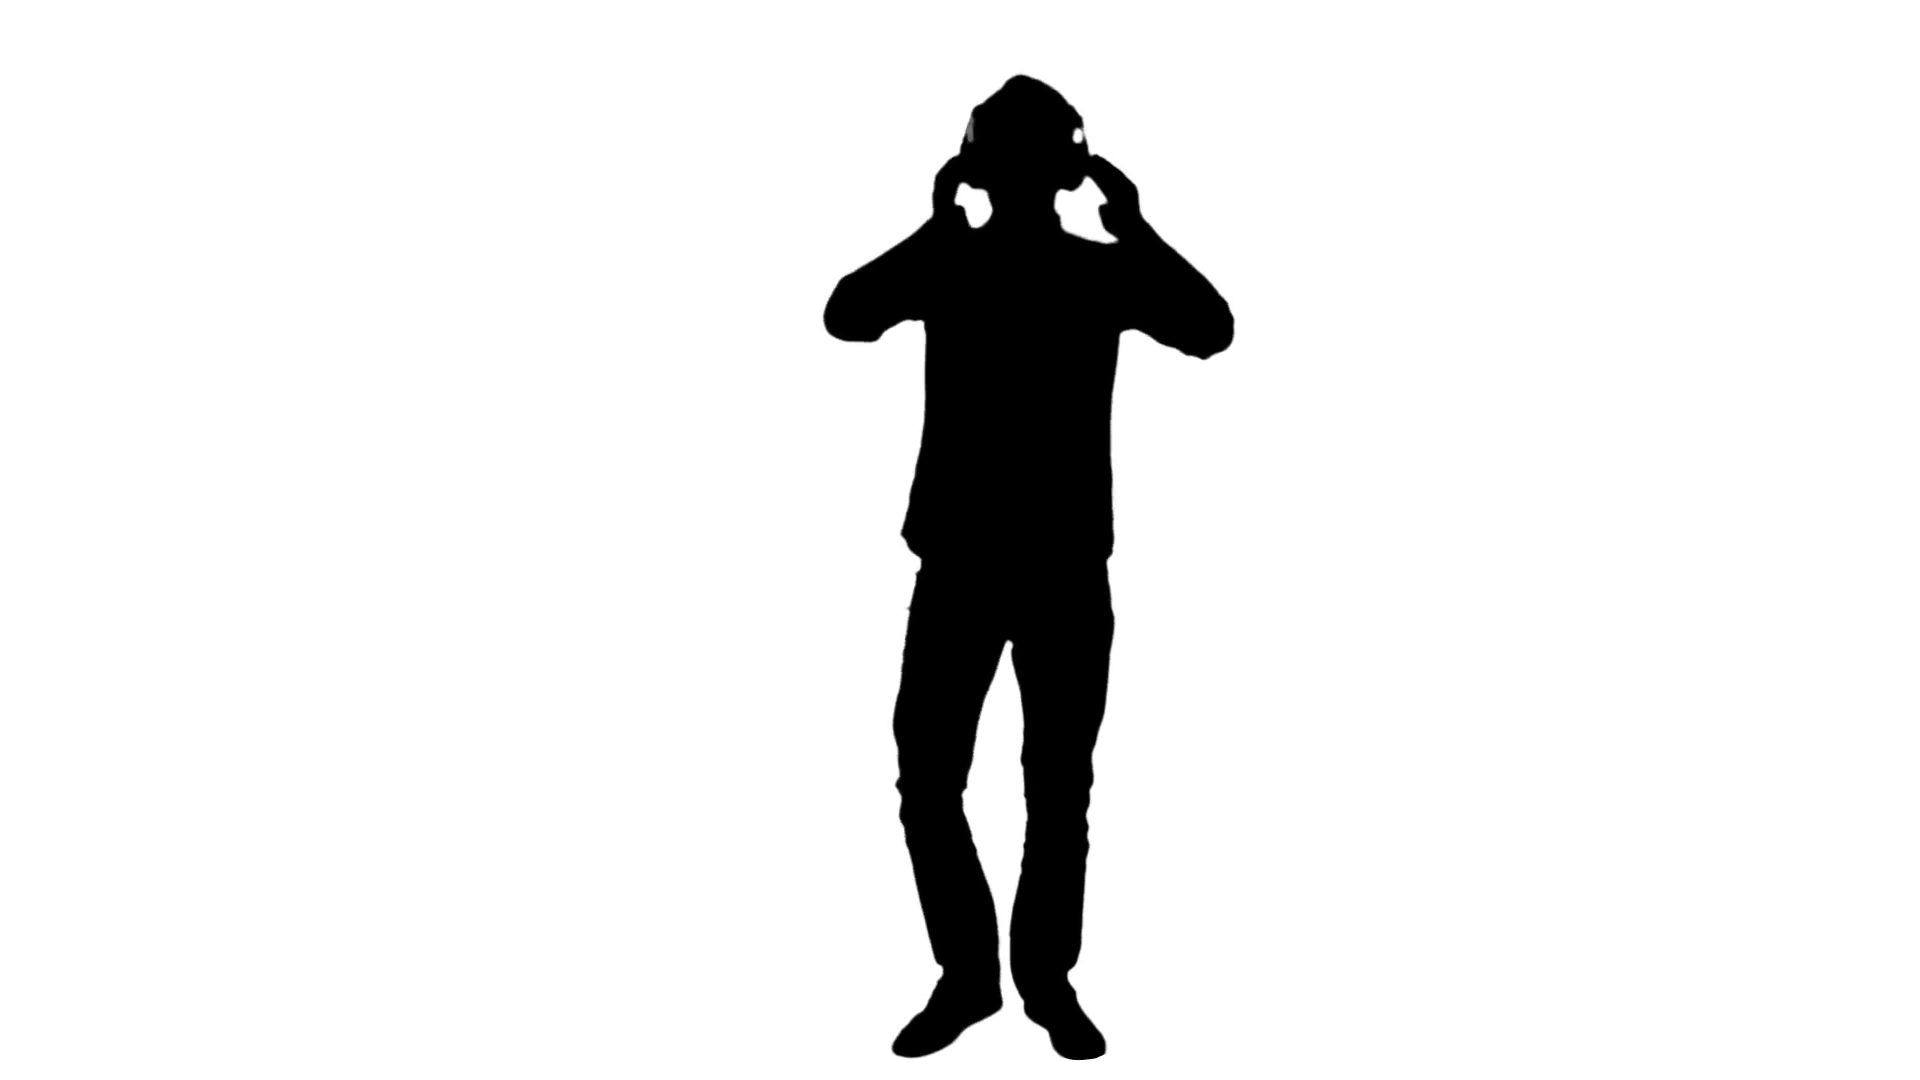 1920x1080 Dancer Silhouette With Headphones